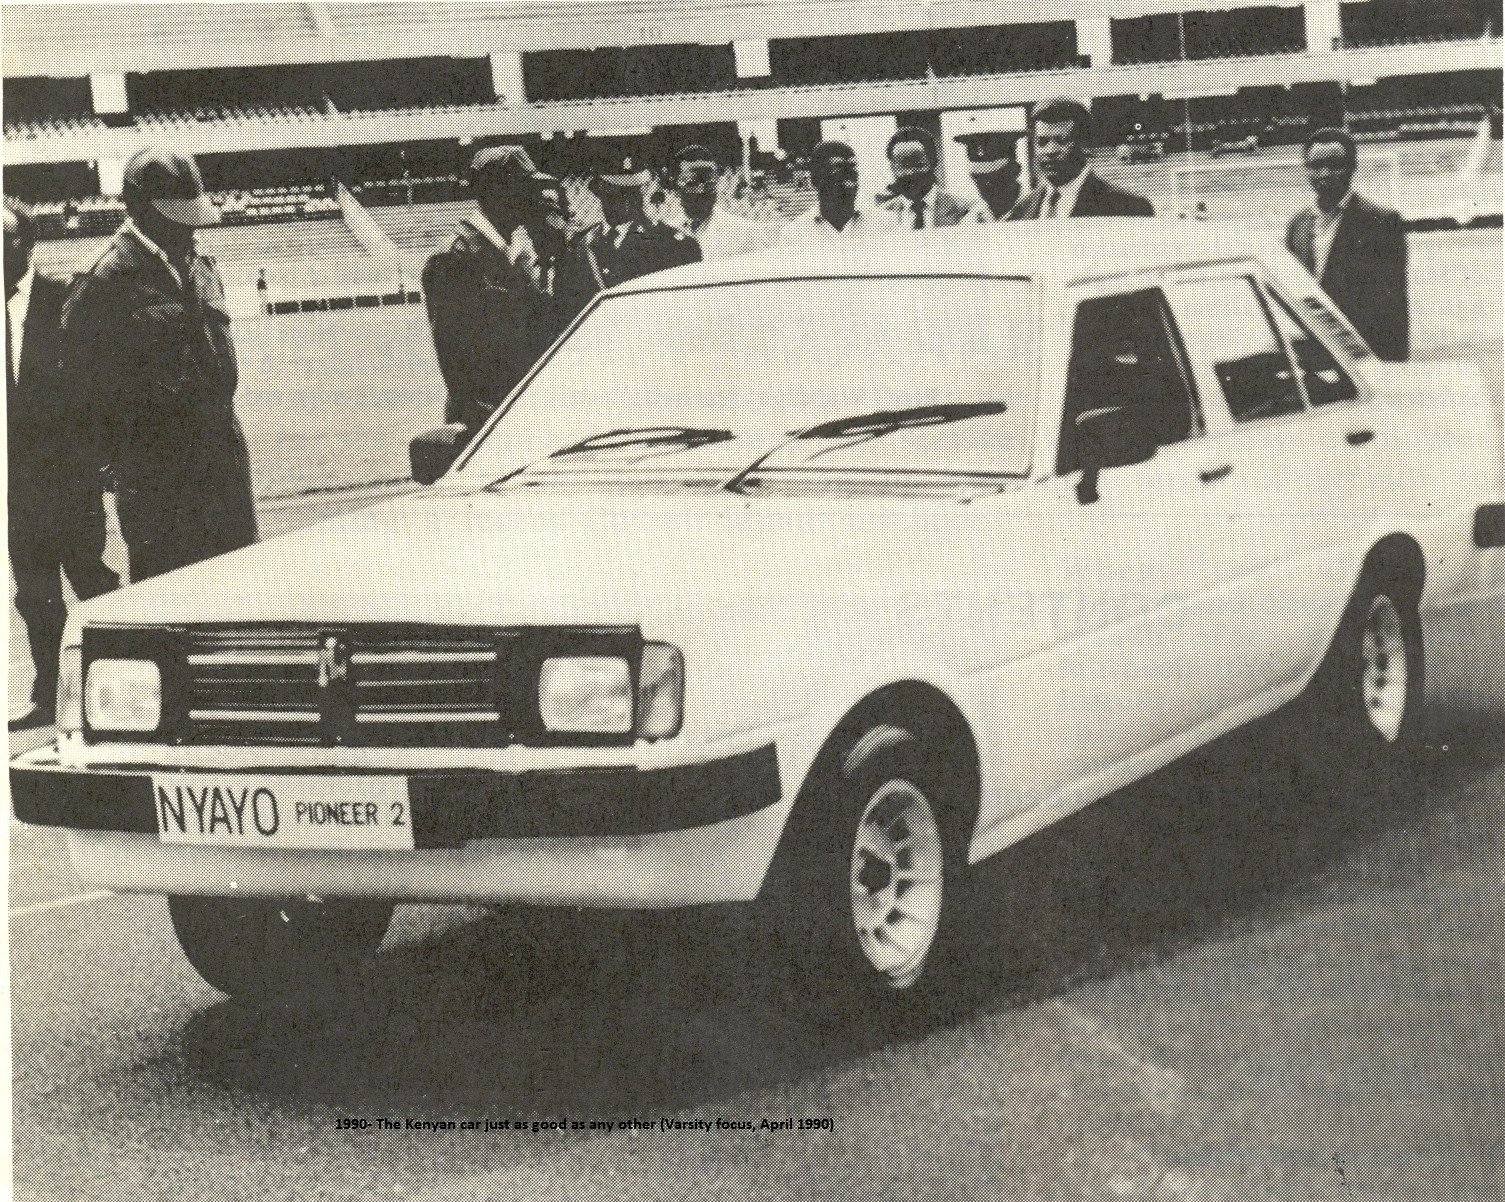 List Of Cars Locally Made In Kenya – Victor Matara